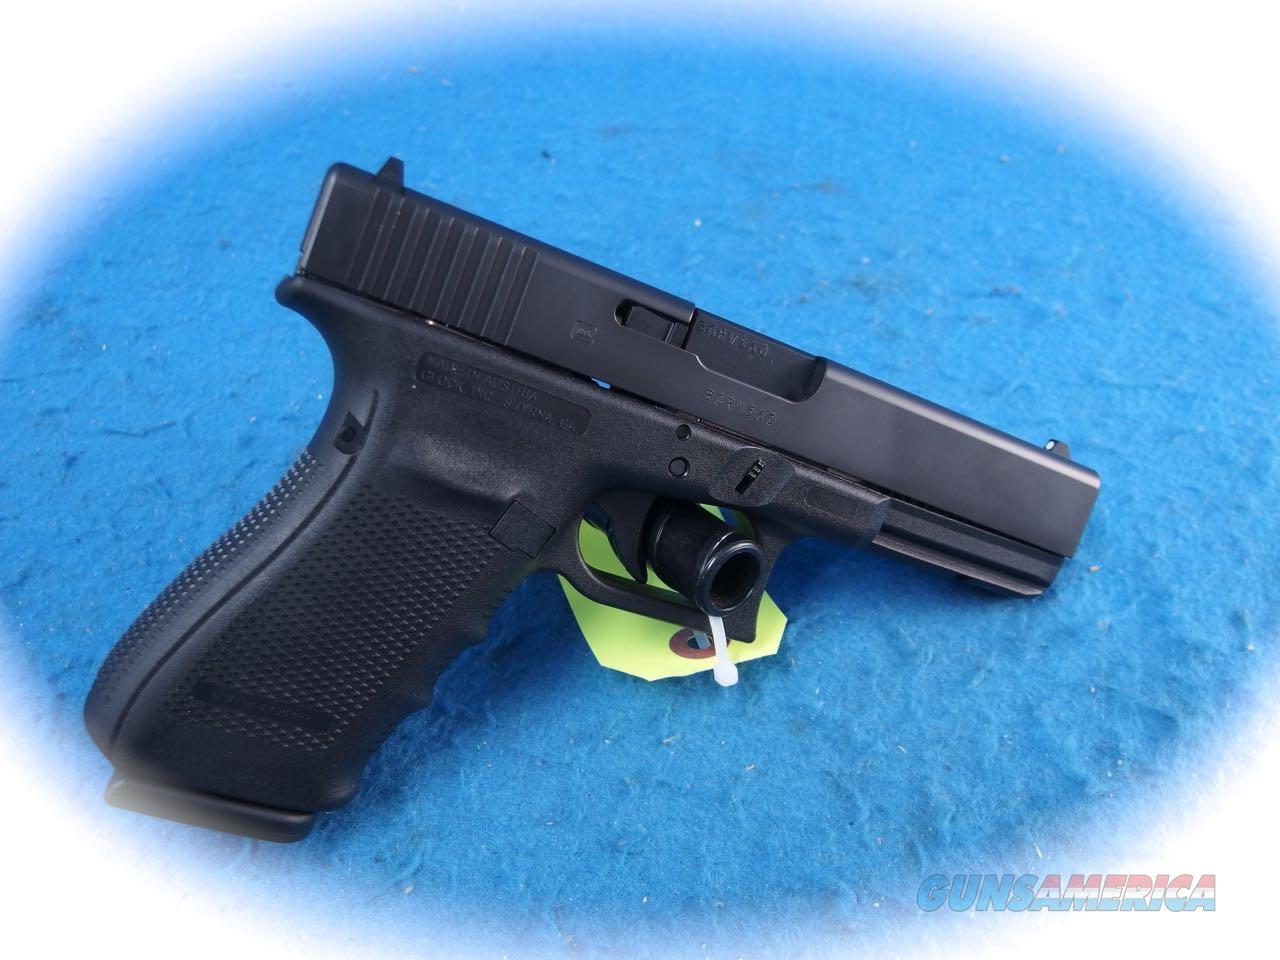 Glock Model 20 Gen 4 10MM Semi Auto Pistol **New**  Guns > Pistols > Glock Pistols > 20/21